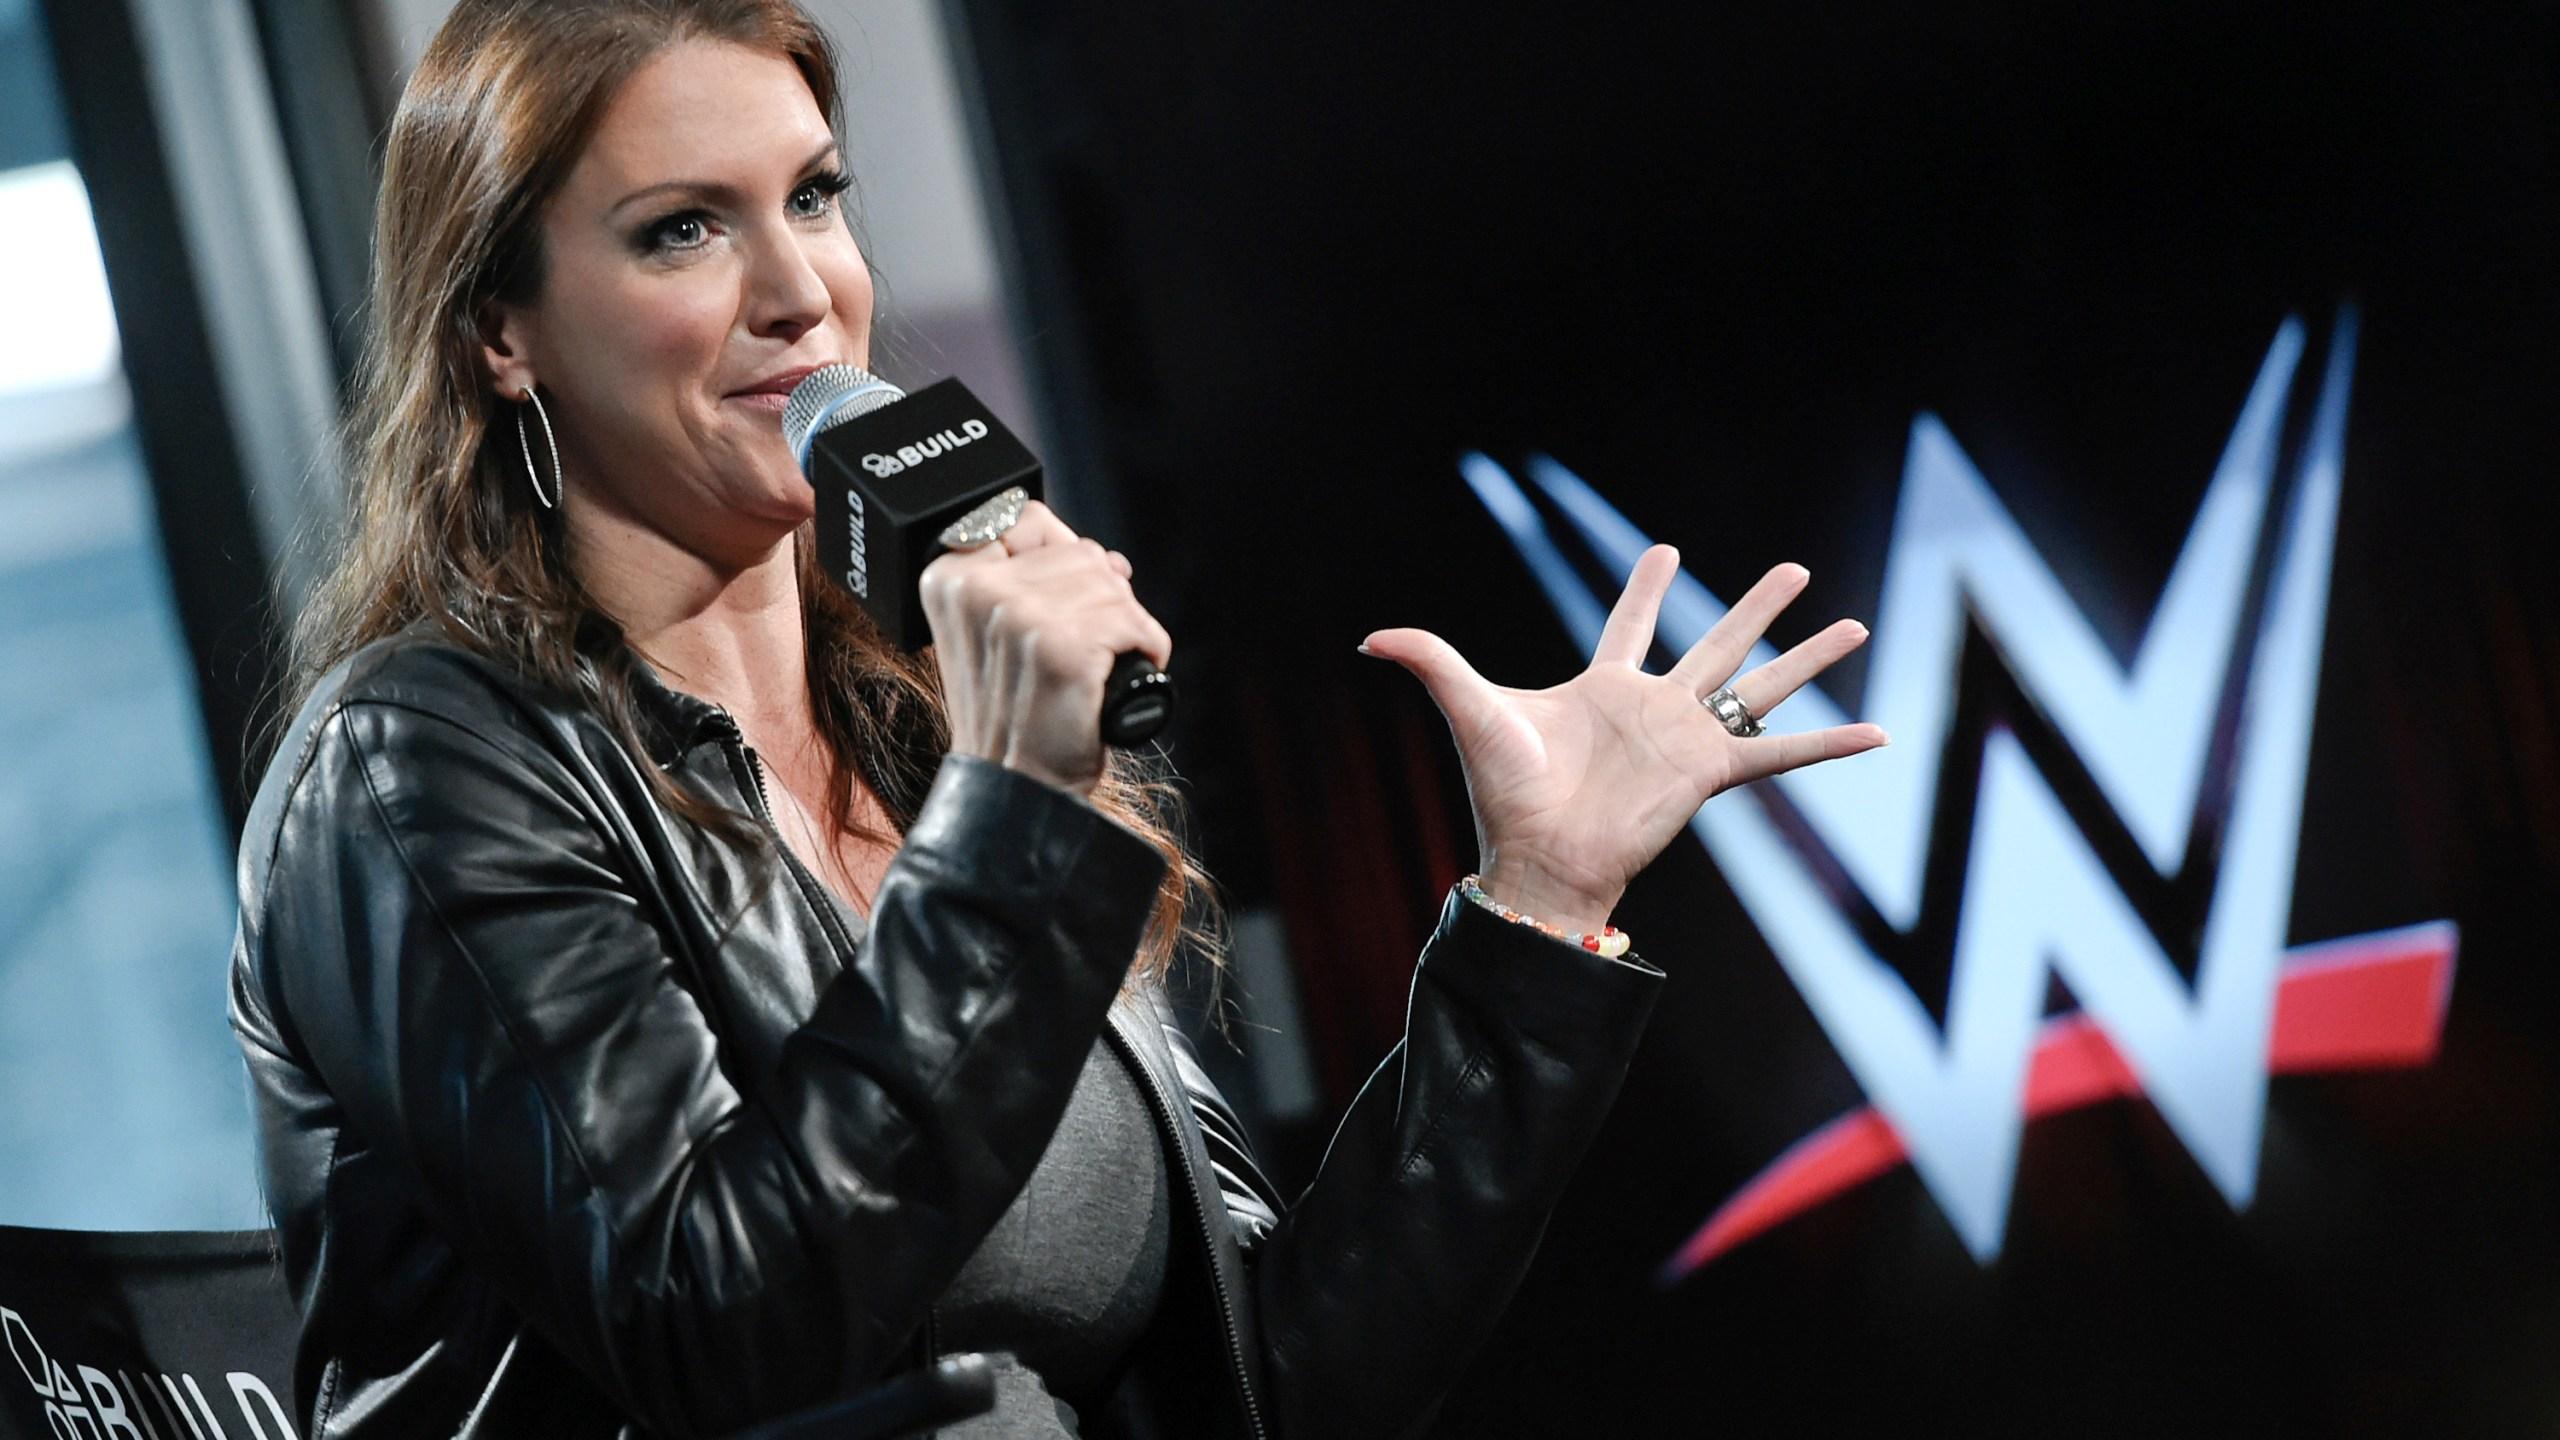 Stephanie McMahon